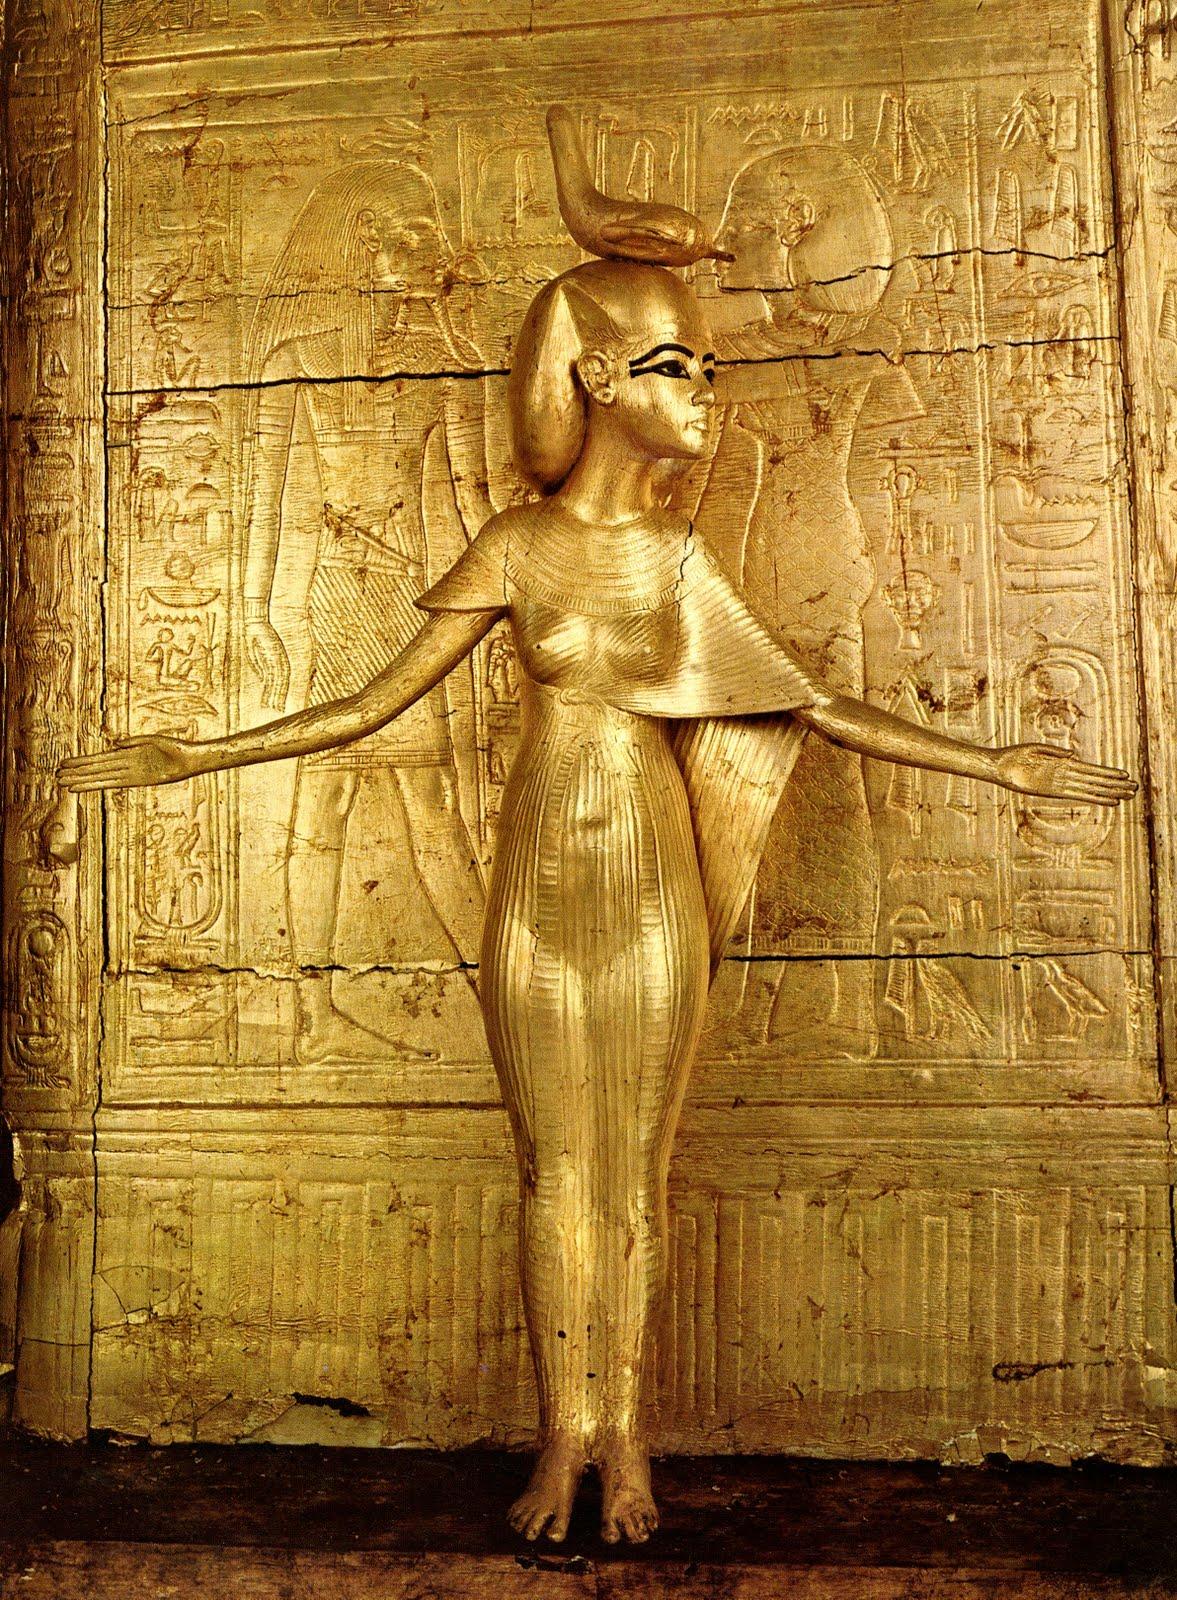 Tutankhamun: The Life & Death of the Boy Pharaoh